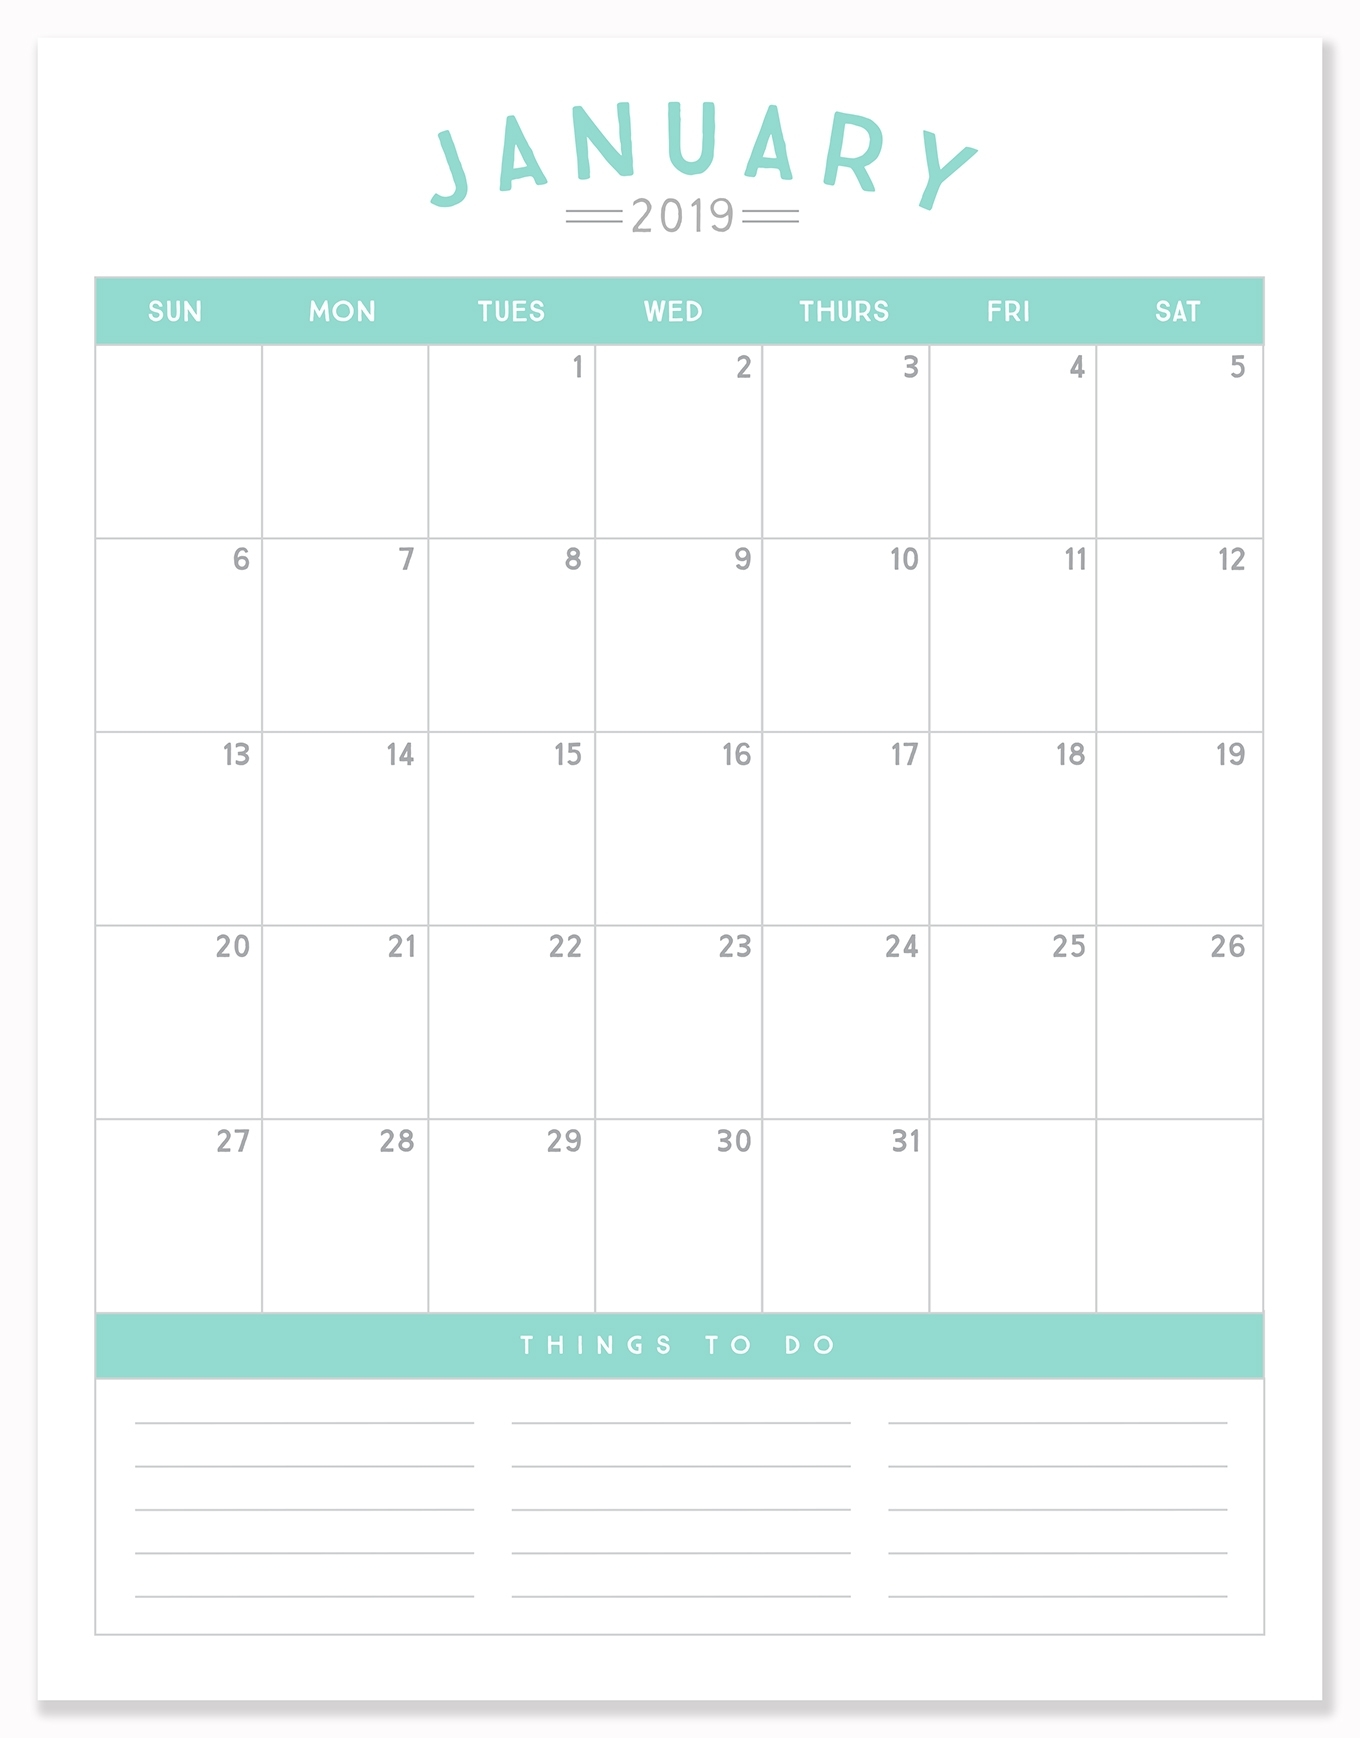 2019 Printable Calendar Download - Simple As That